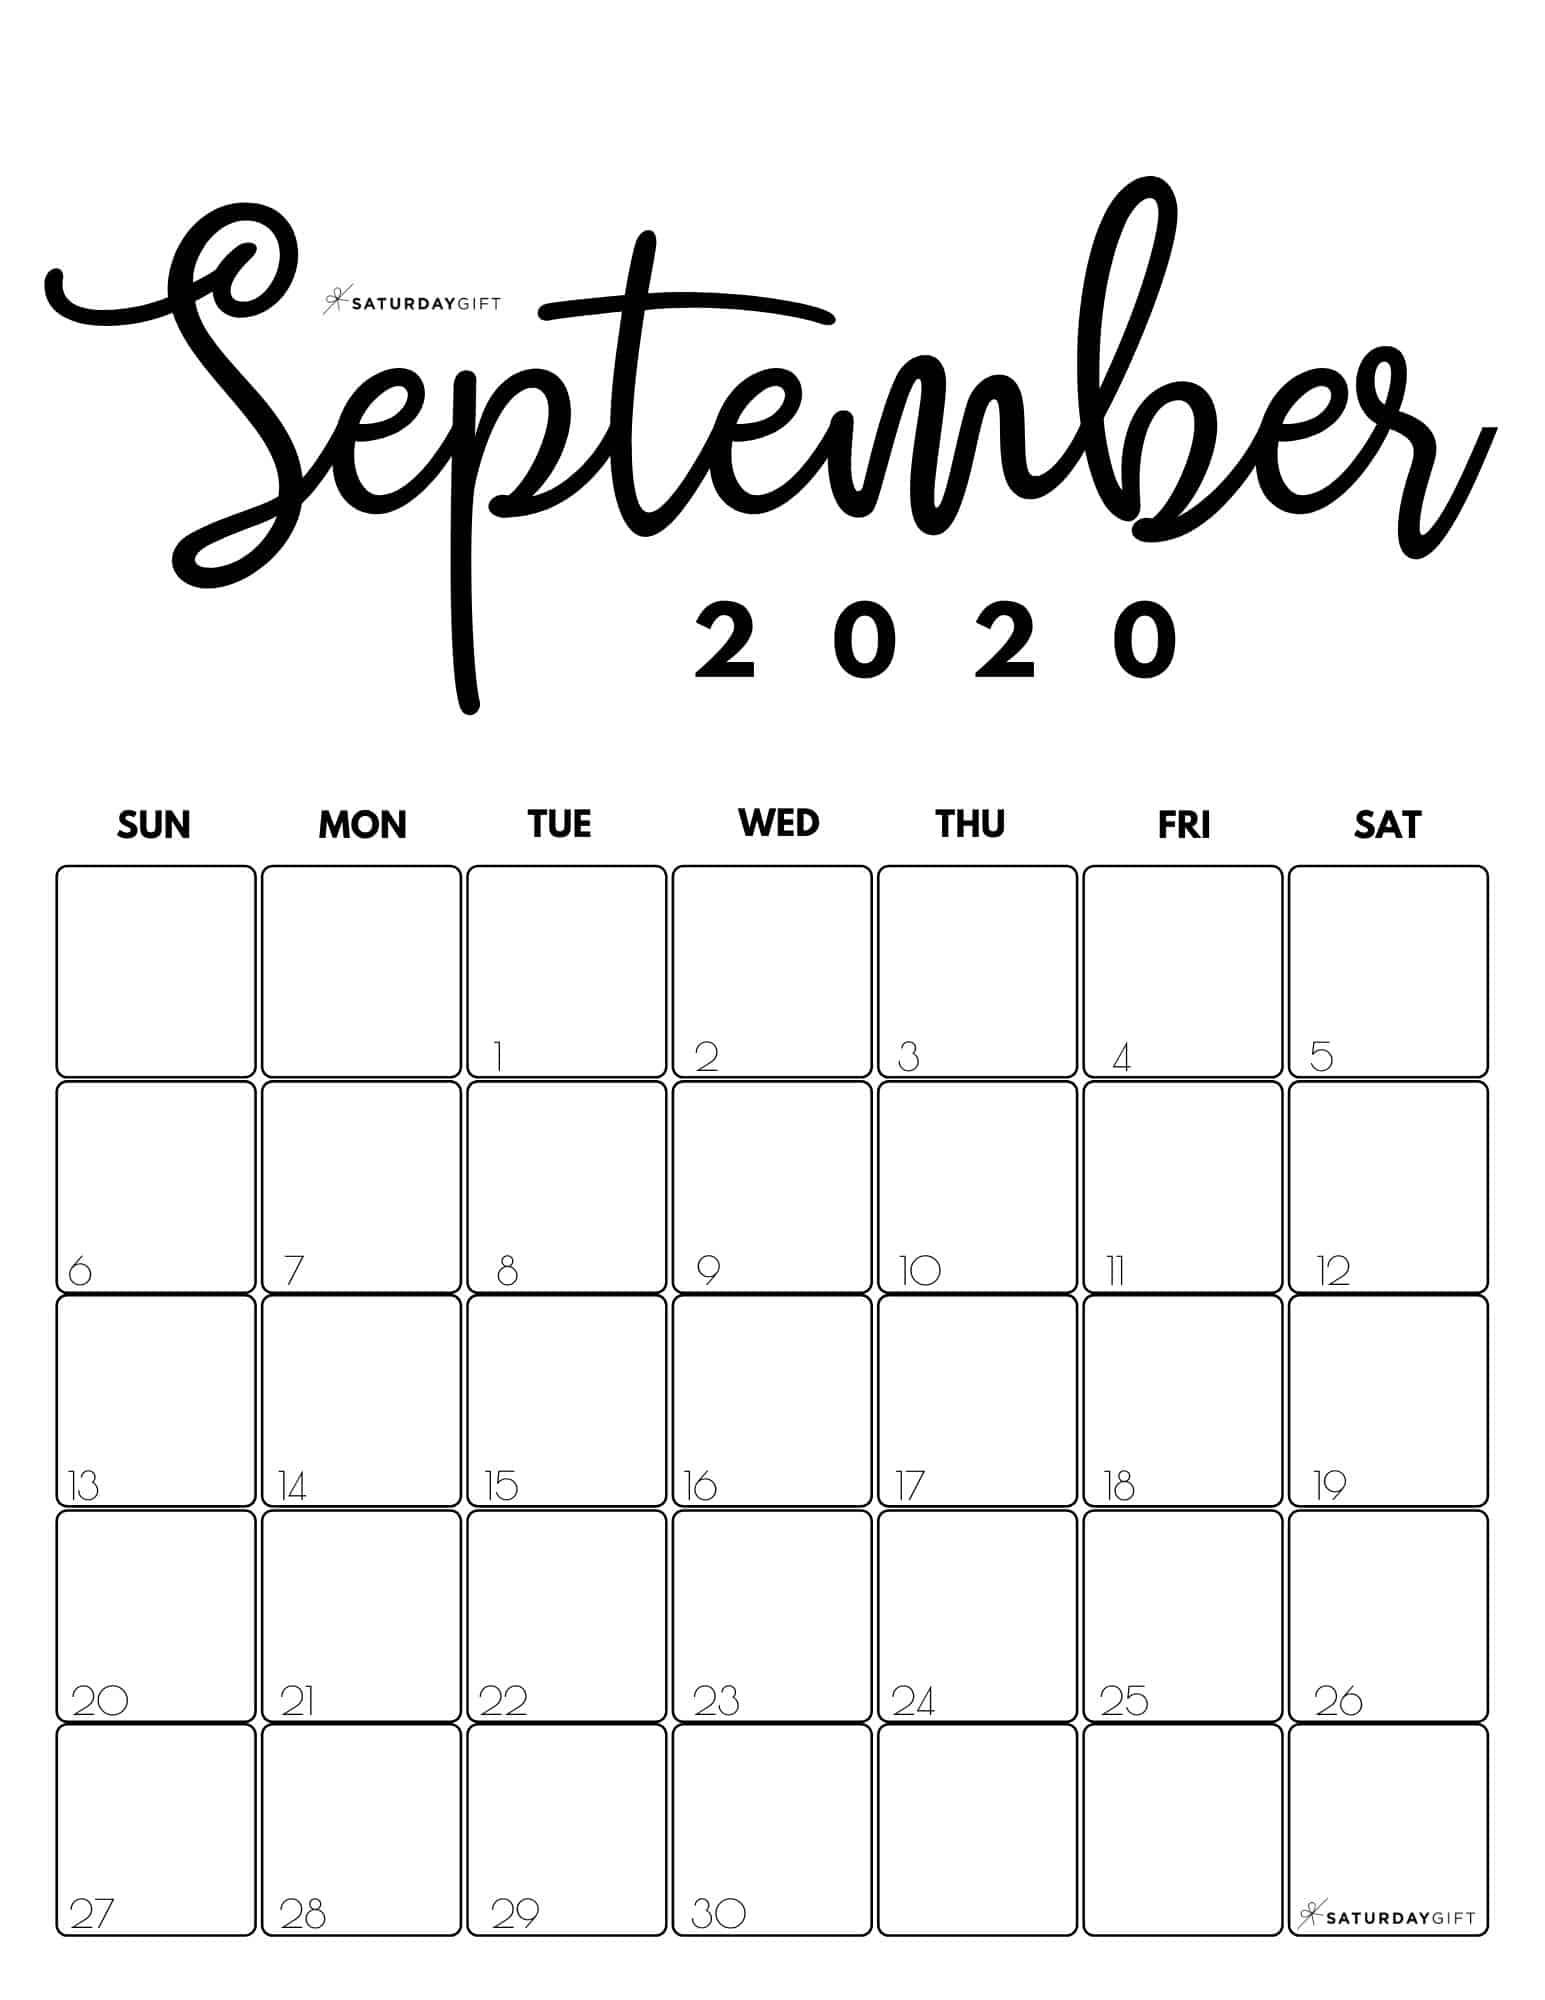 Cute Free Printable September 2020 Calendar Saturdaygift In 2020 September Calendar Calendar Printables Free Printable Calendar